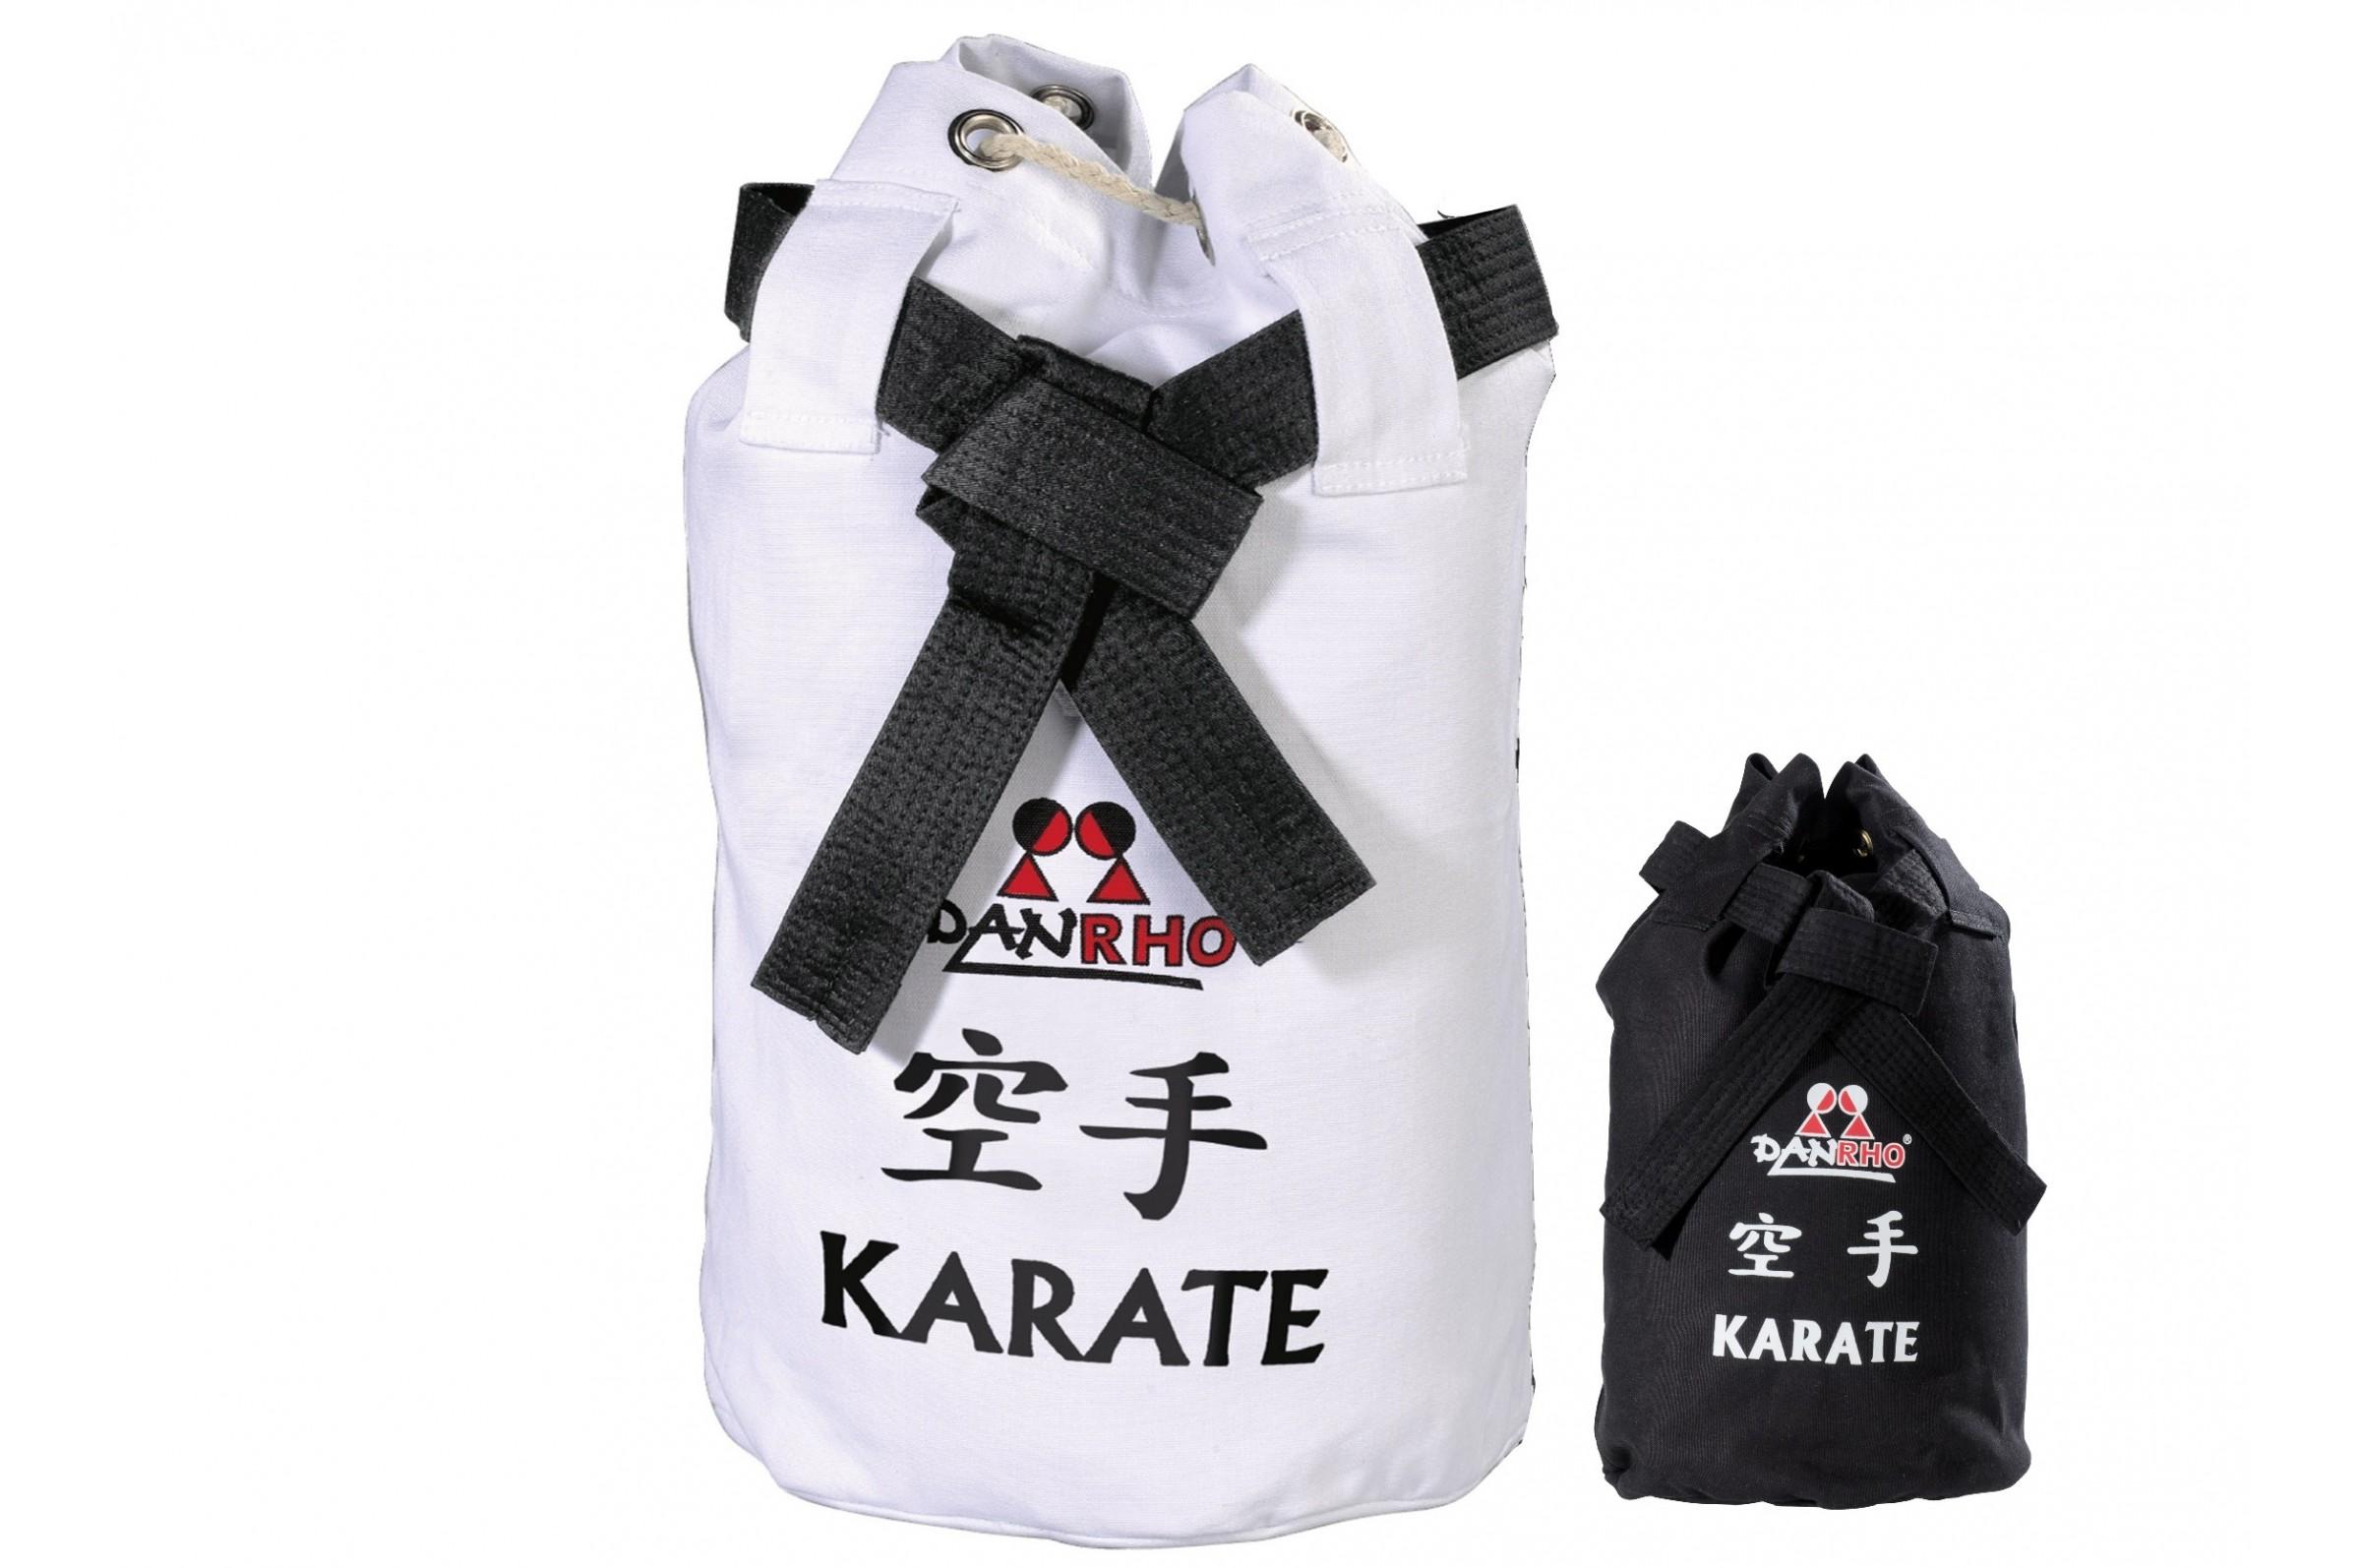 db038558f Bolso Pequeño para Kimono - Karate, Danrho - DragonSports.eu